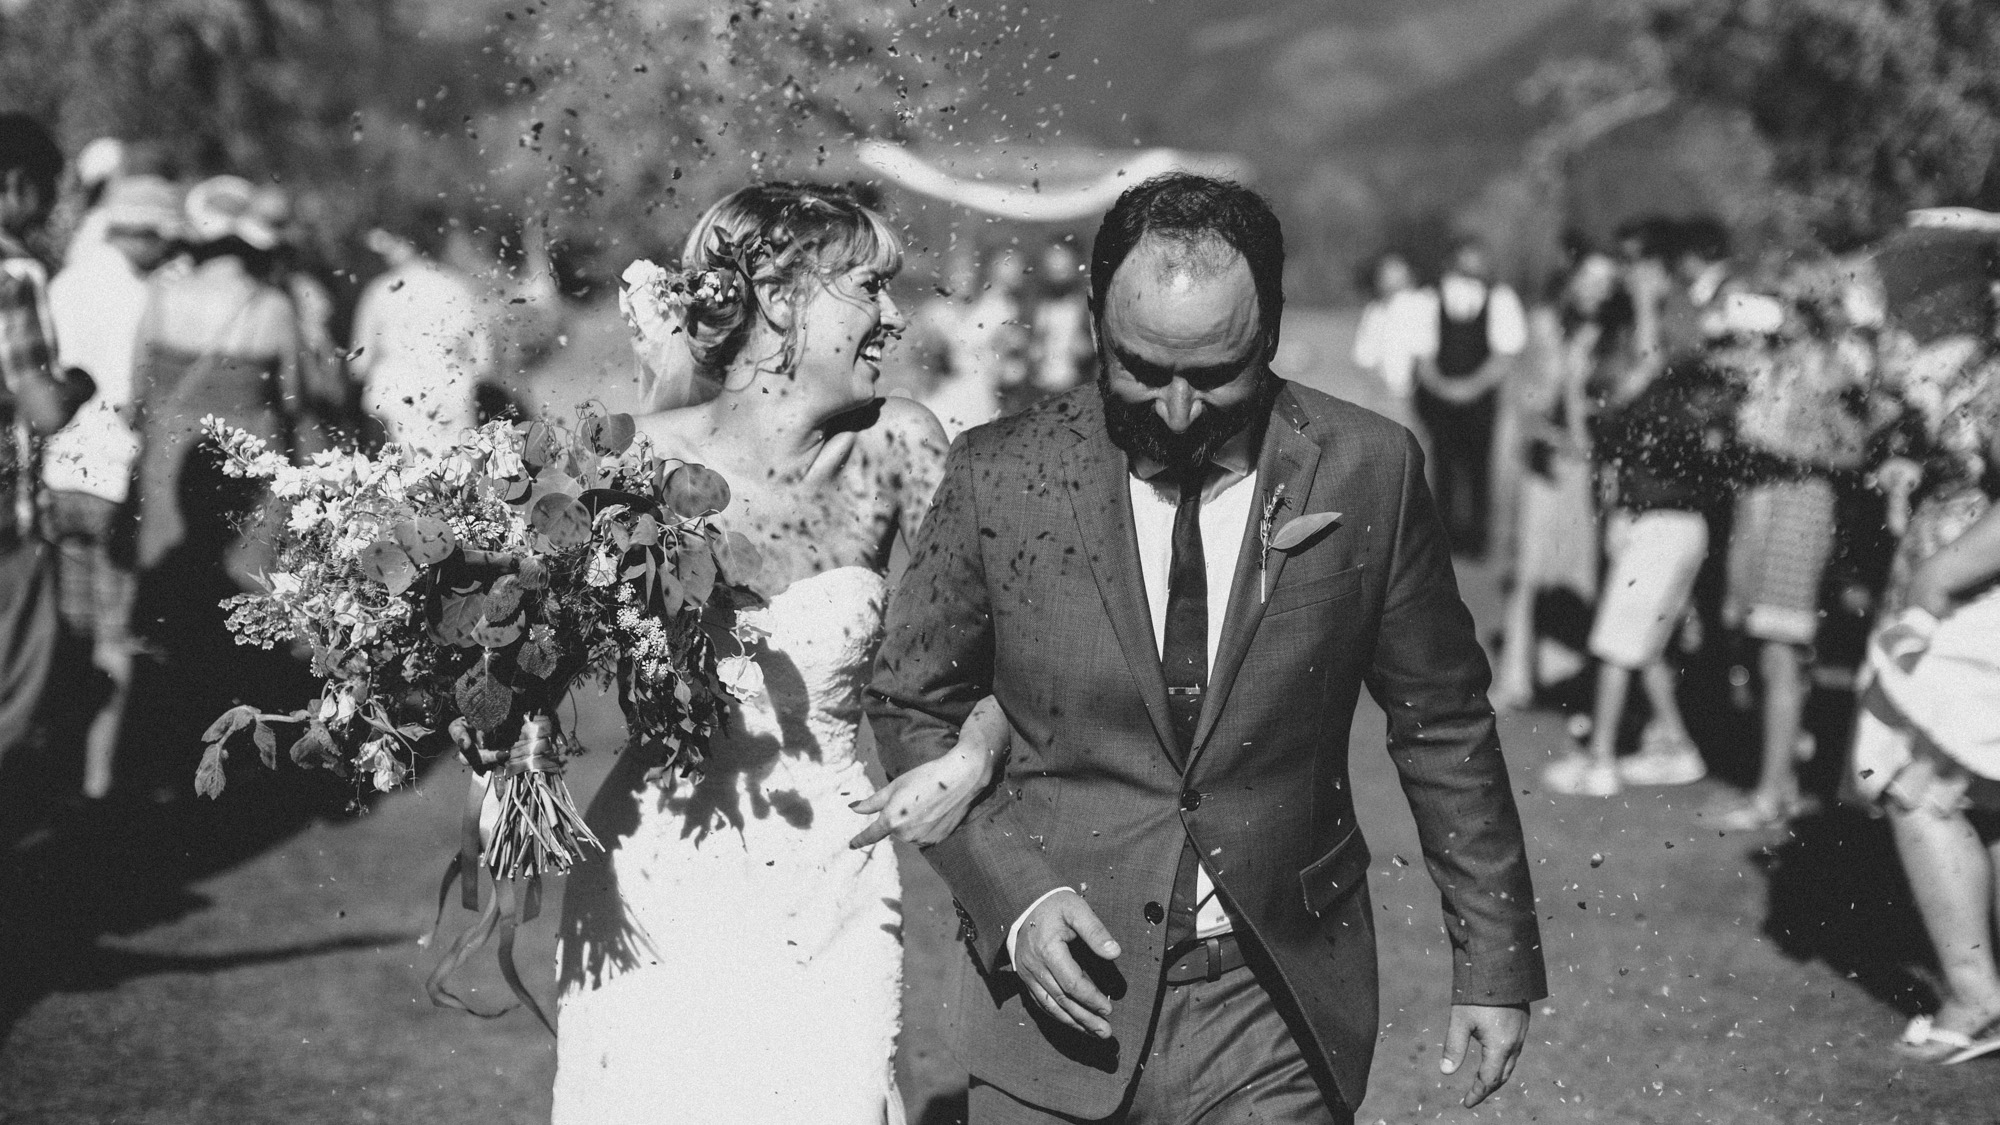 Montana_Wedding_Photos_alec_vanderboom-0097.jpg